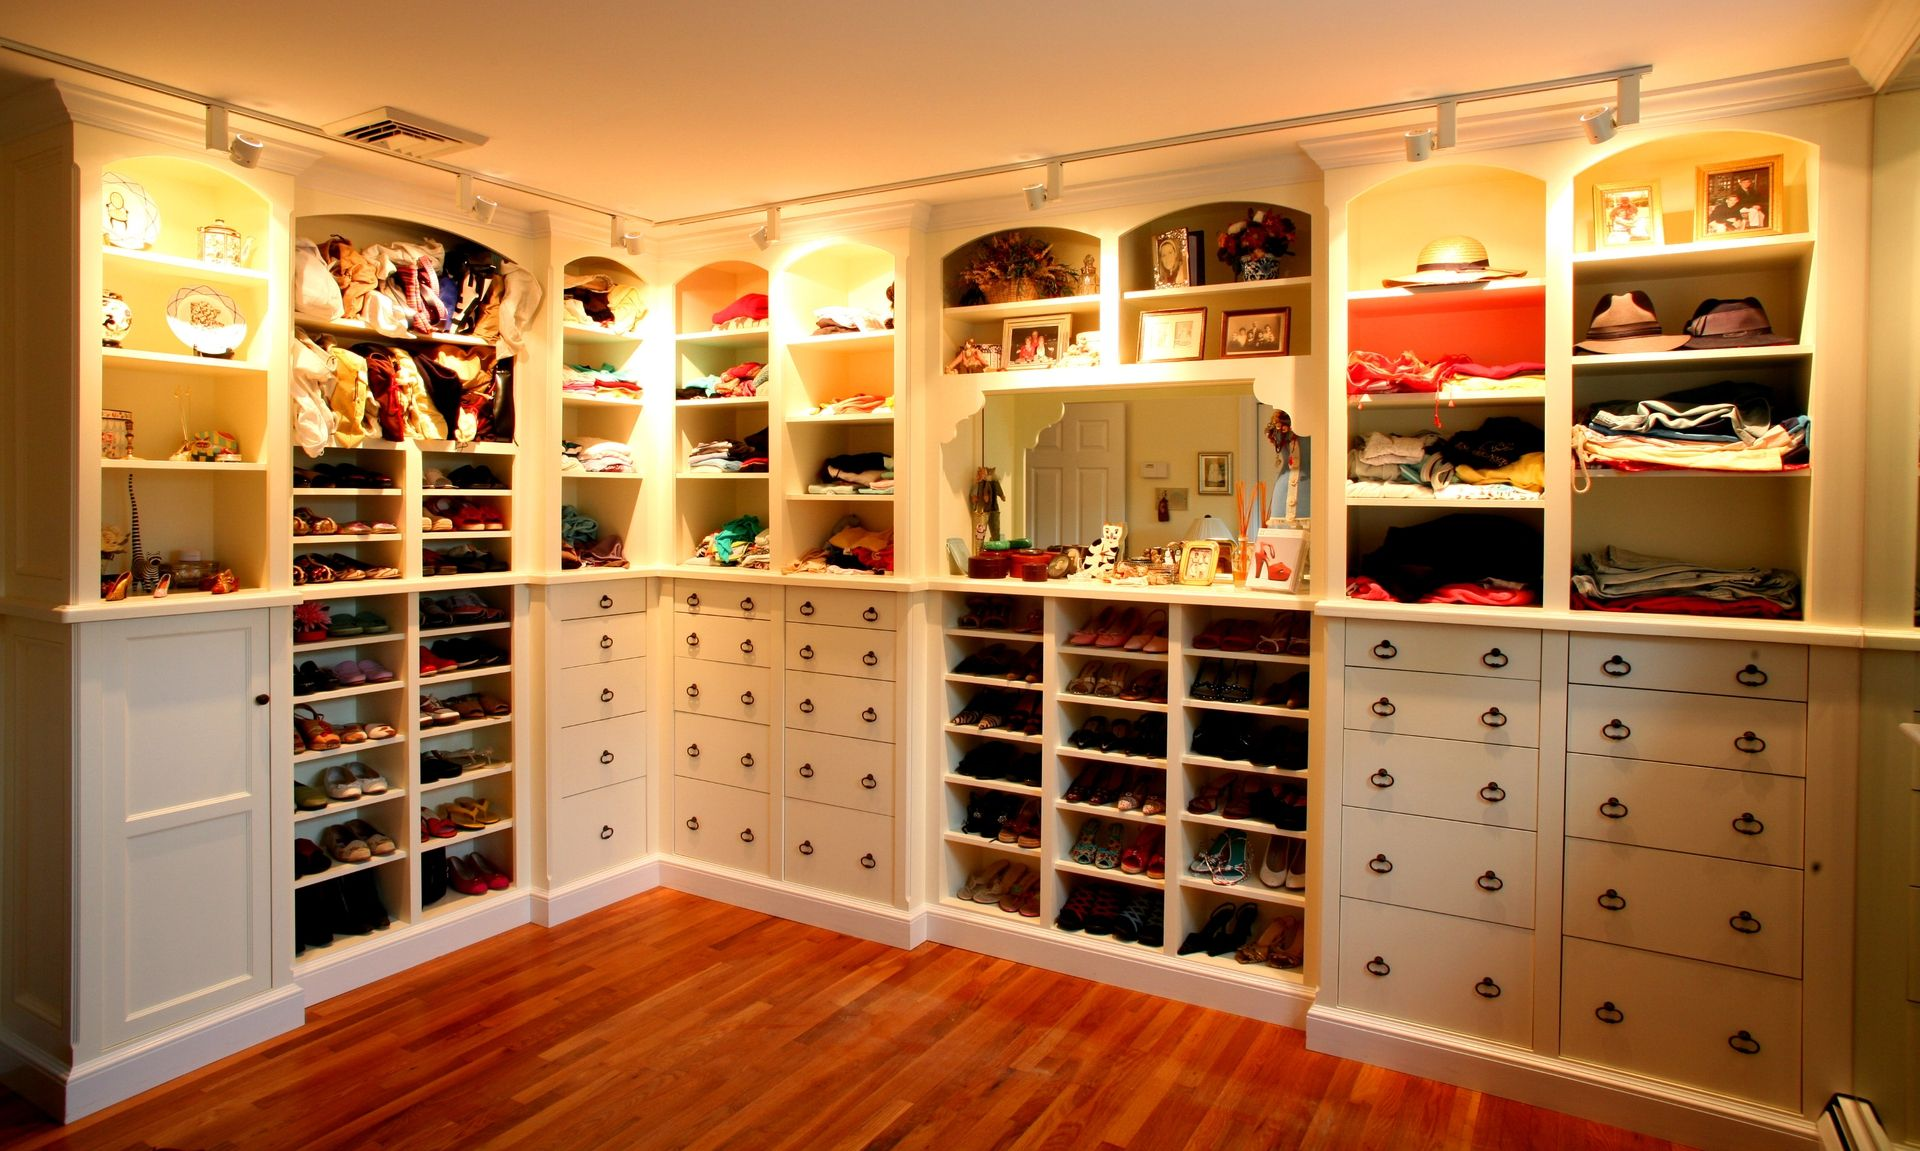 Bedroom Closets Designs Beauteous Teens Bedroom  Closet And Wardrobe Designs Lovely Smart Saving Design Decoration